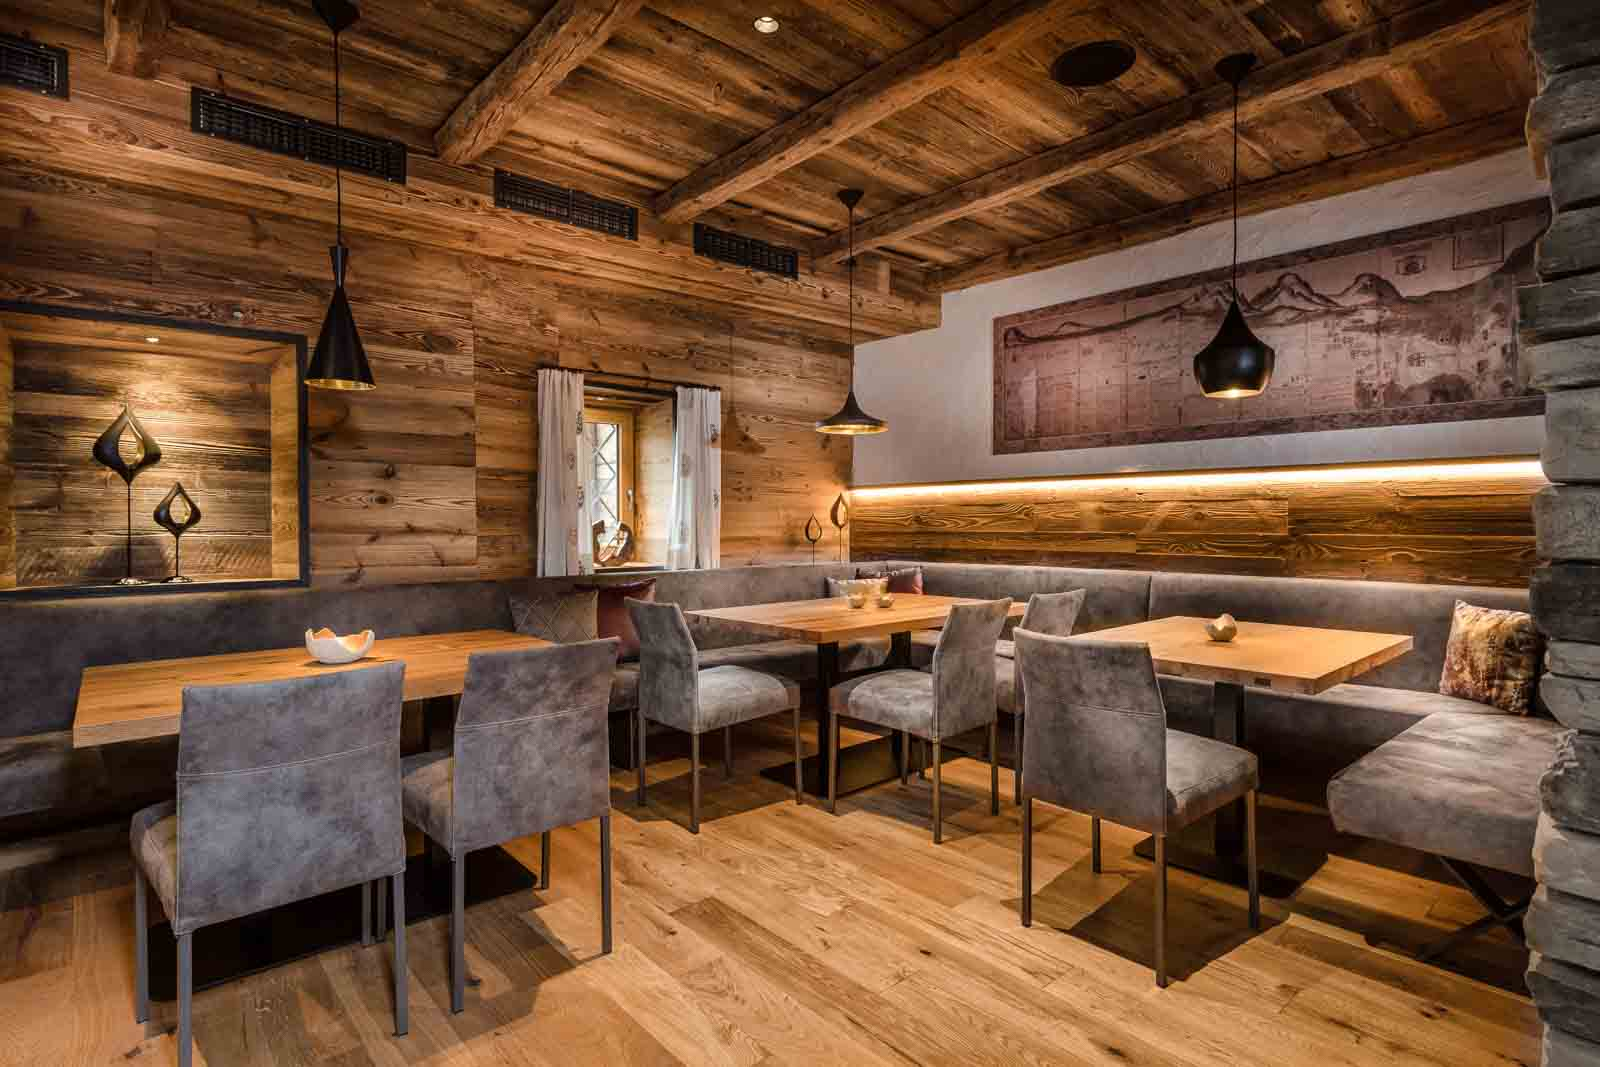 sendlhofer-restaurant-aurum